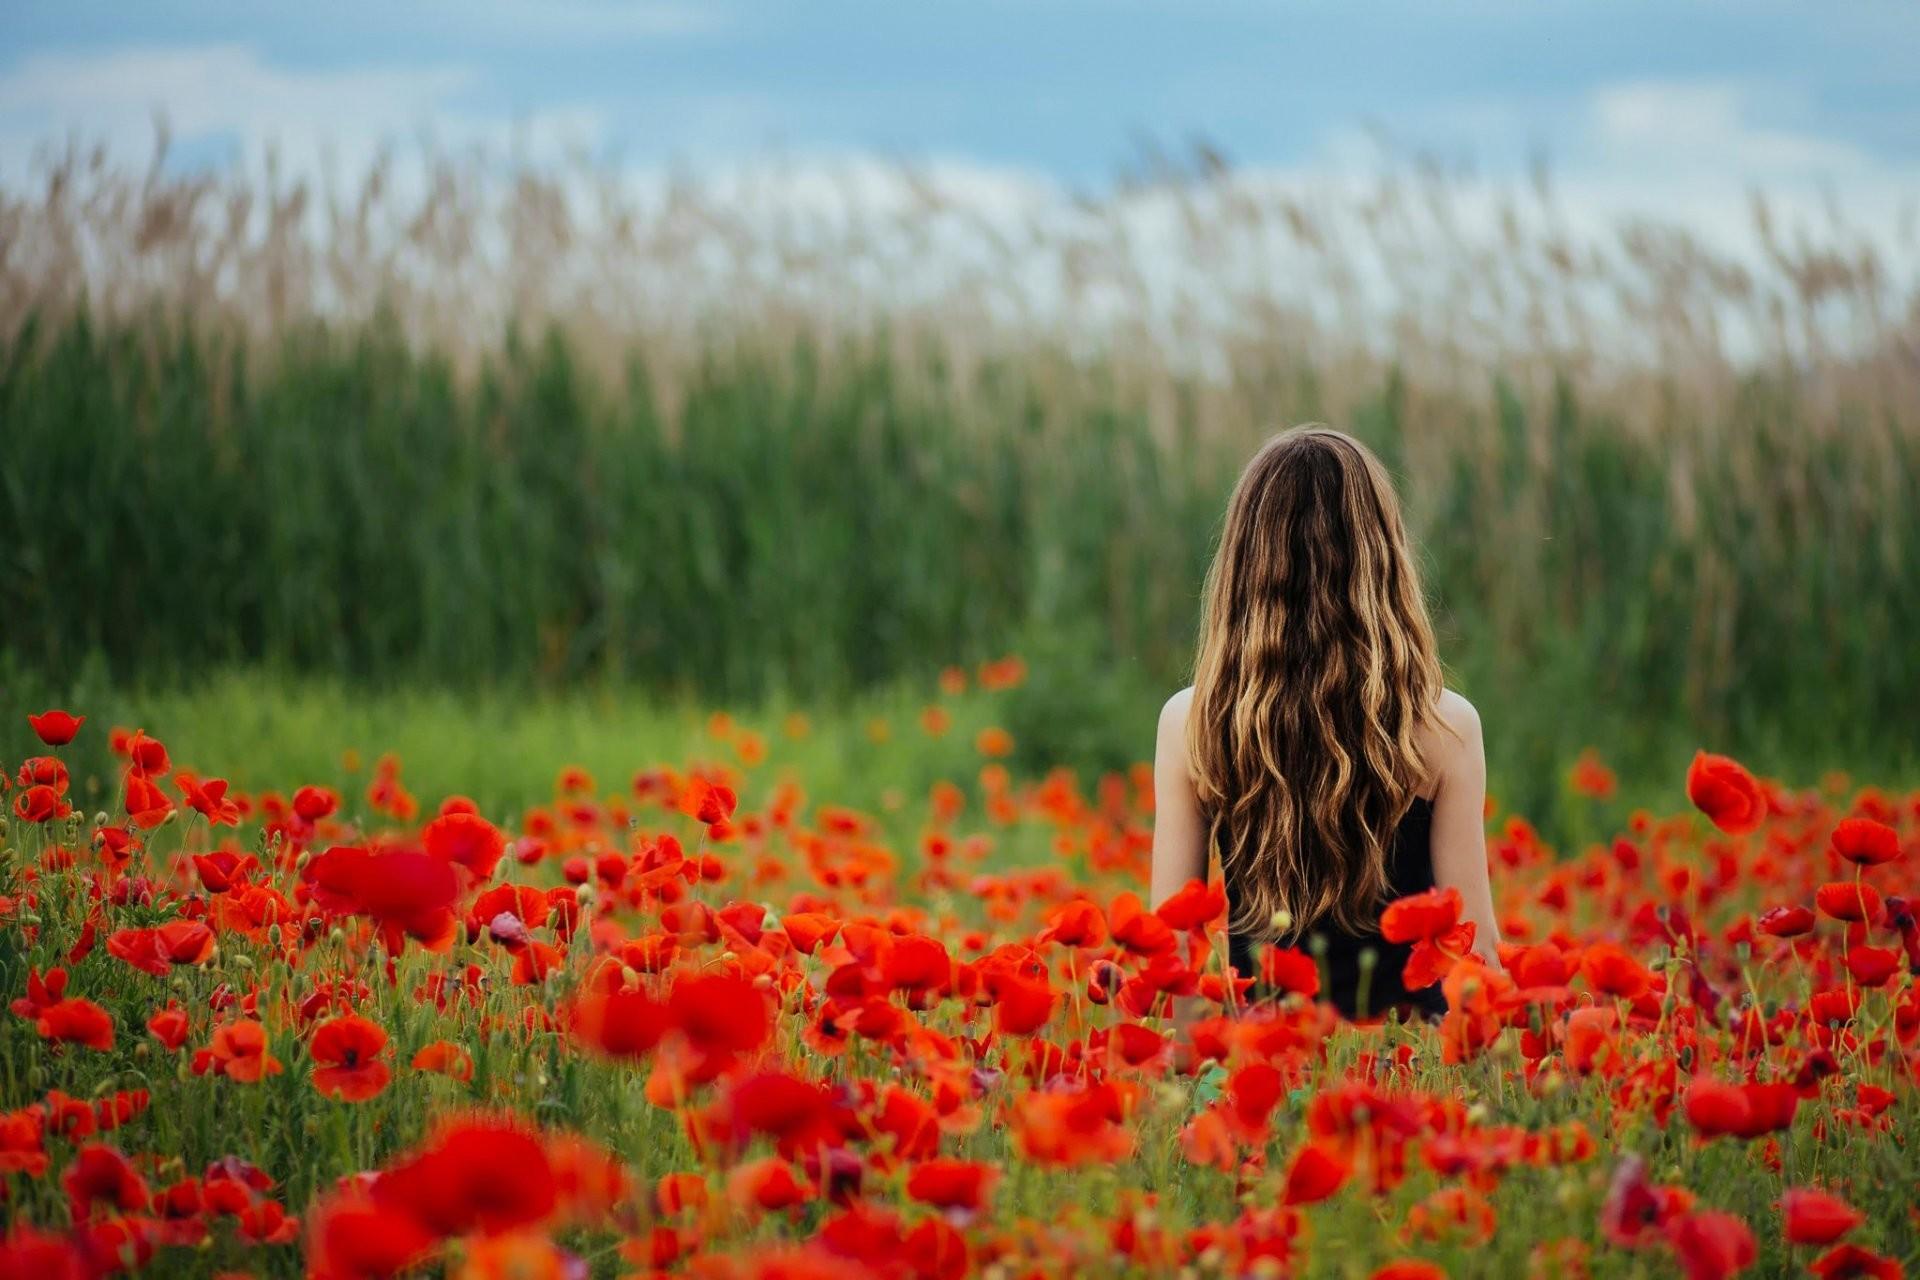 poppies the field flower girl